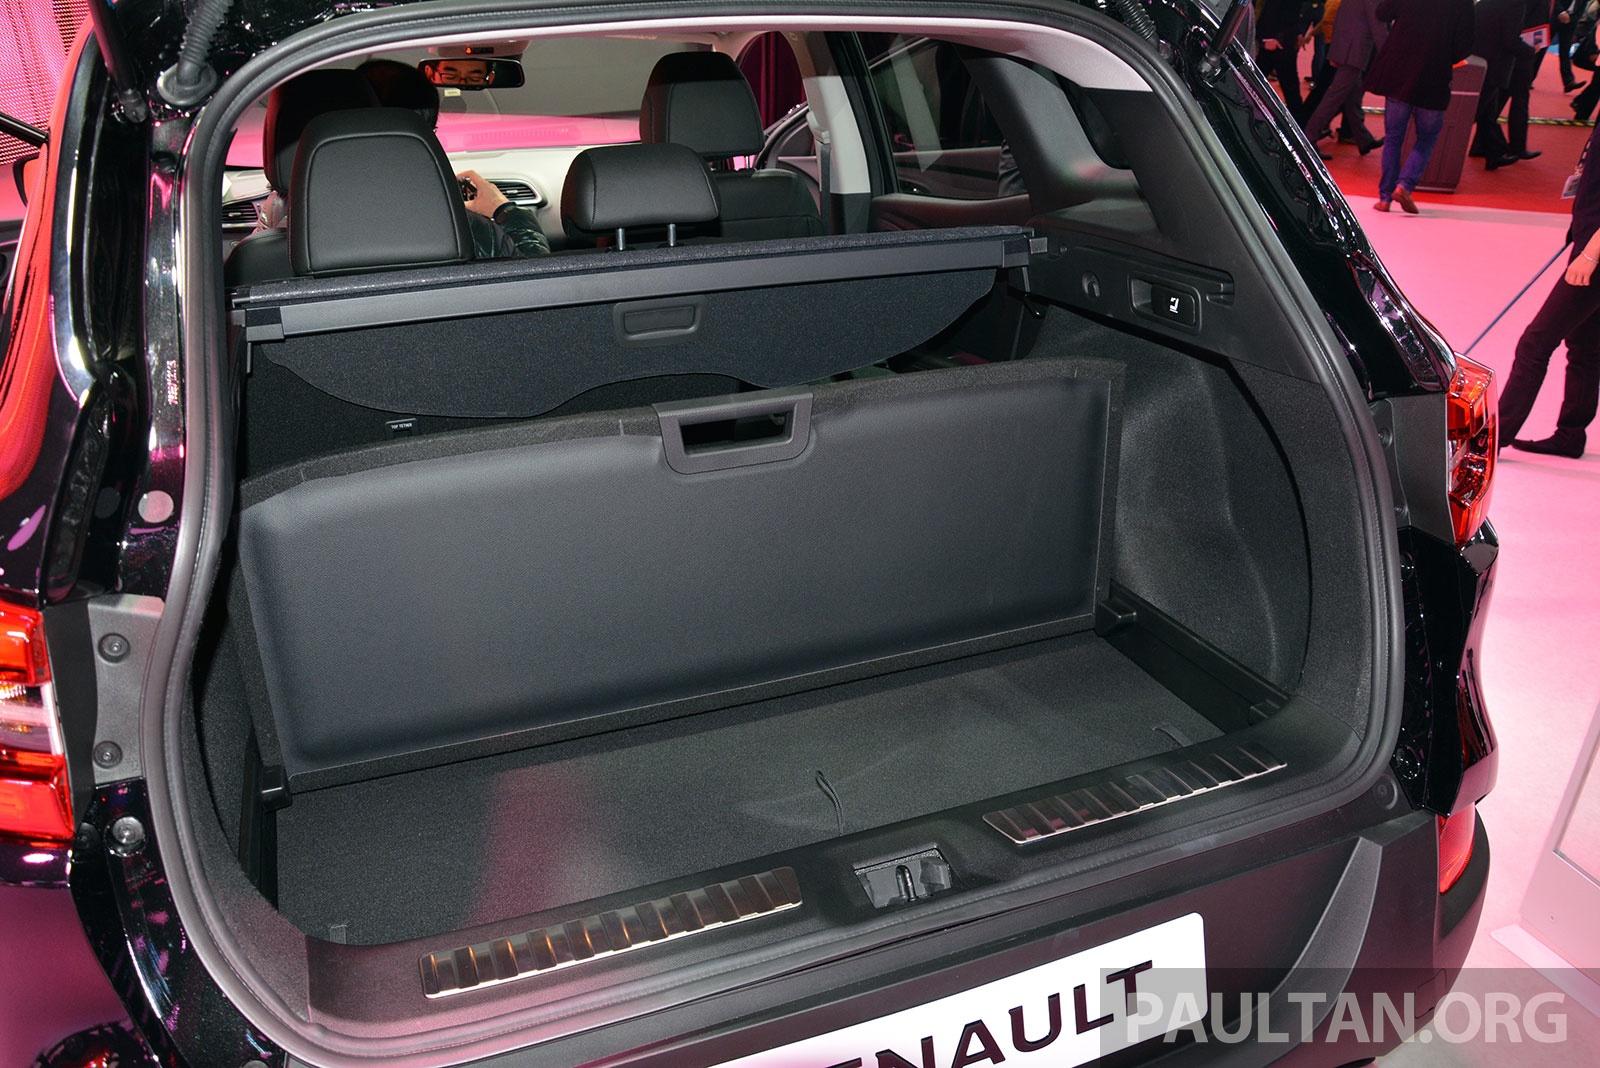 Nissan Qashqai 2017 Interior >> Renault Kadjar SUV – Nissan Qashqai's French sister makes its debut in Geneva; full live gallery ...